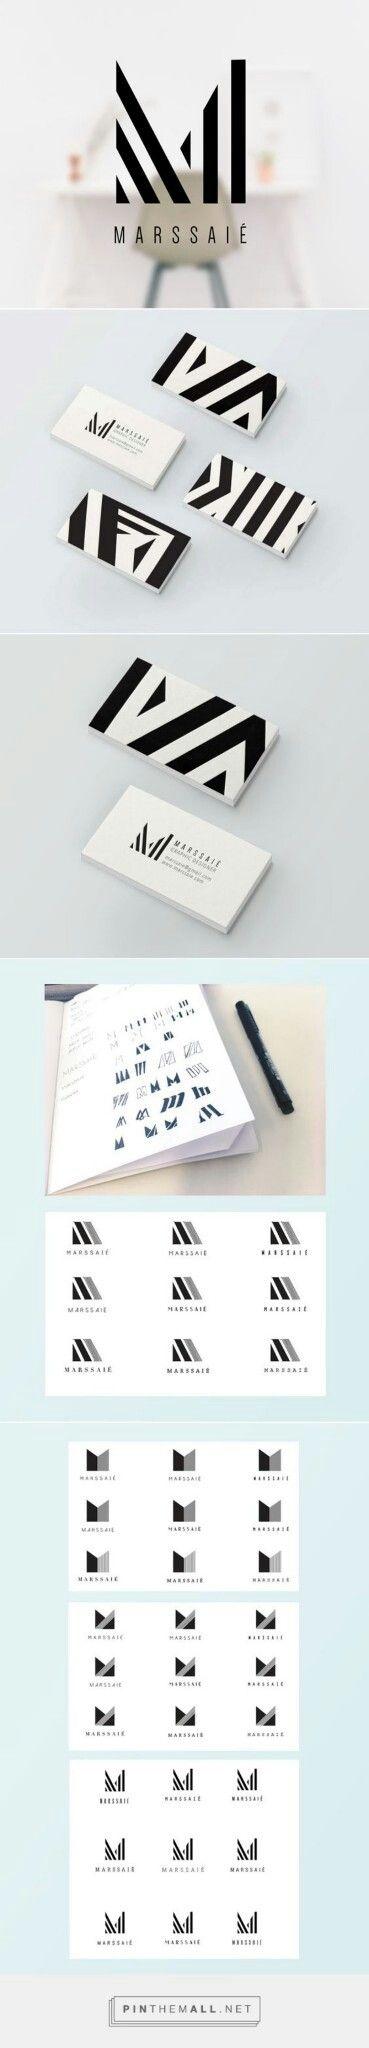 Marssaie Branding| Fivestar Branding – Design and Branding Agency & Inspiration Gallery